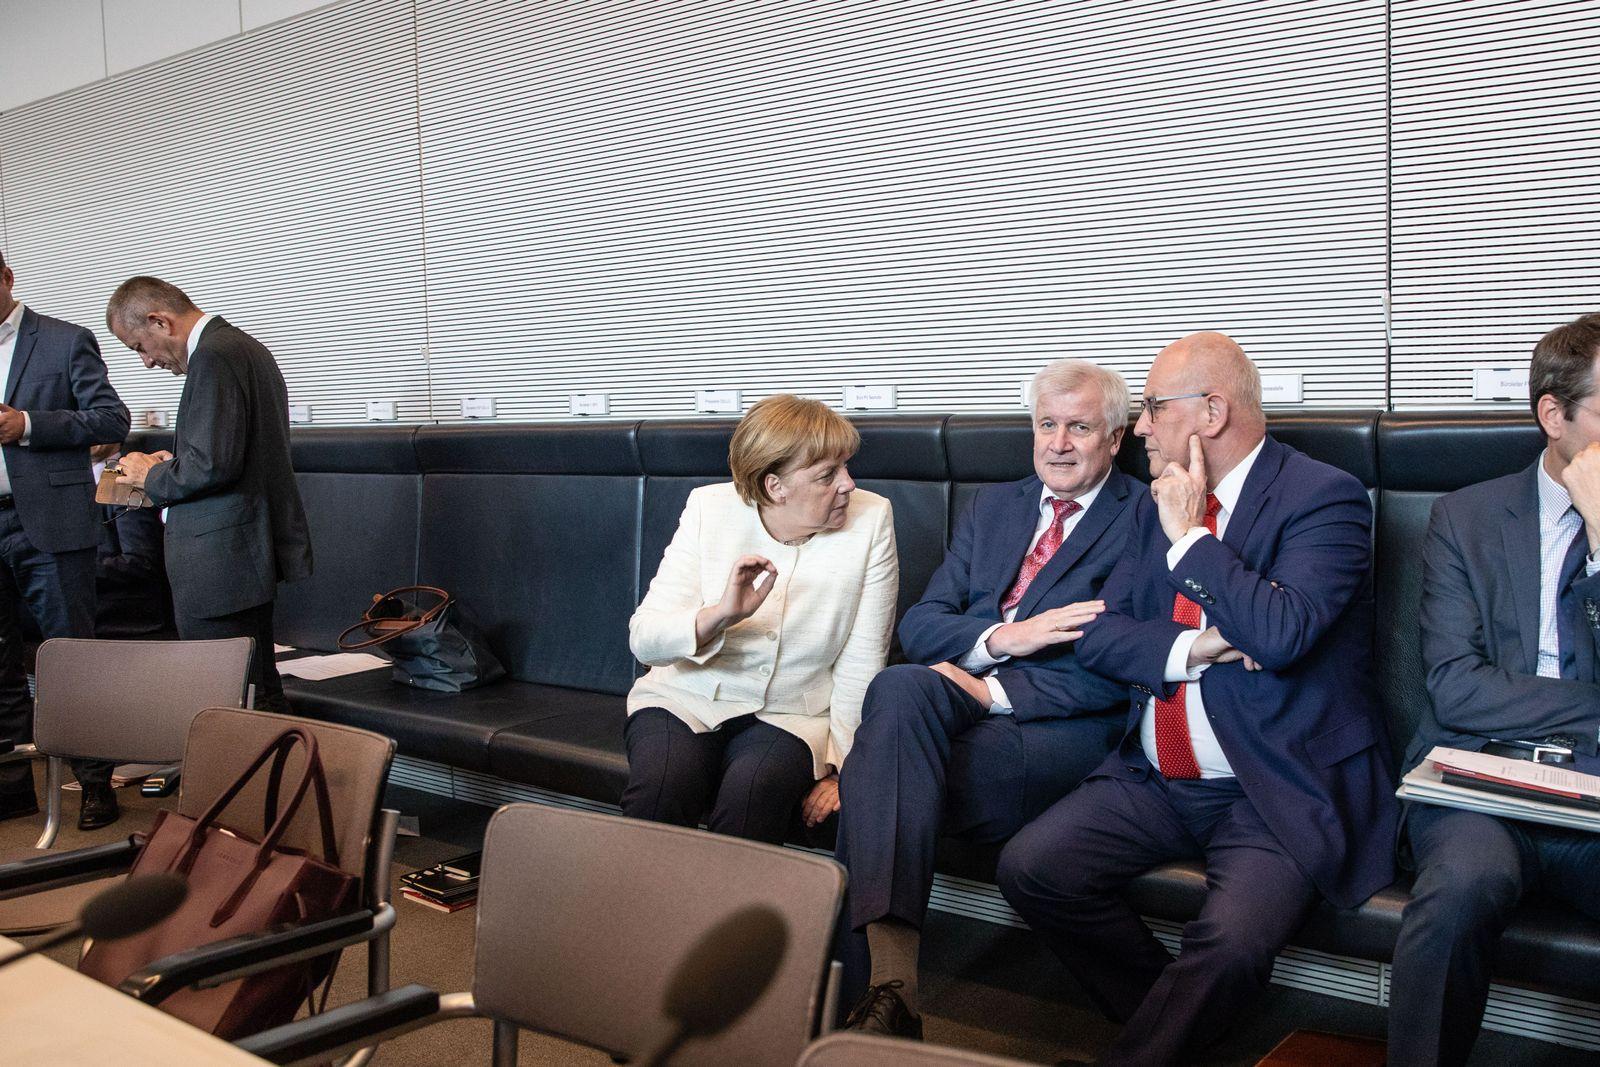 Merkel/ Seehofer/ Kauder